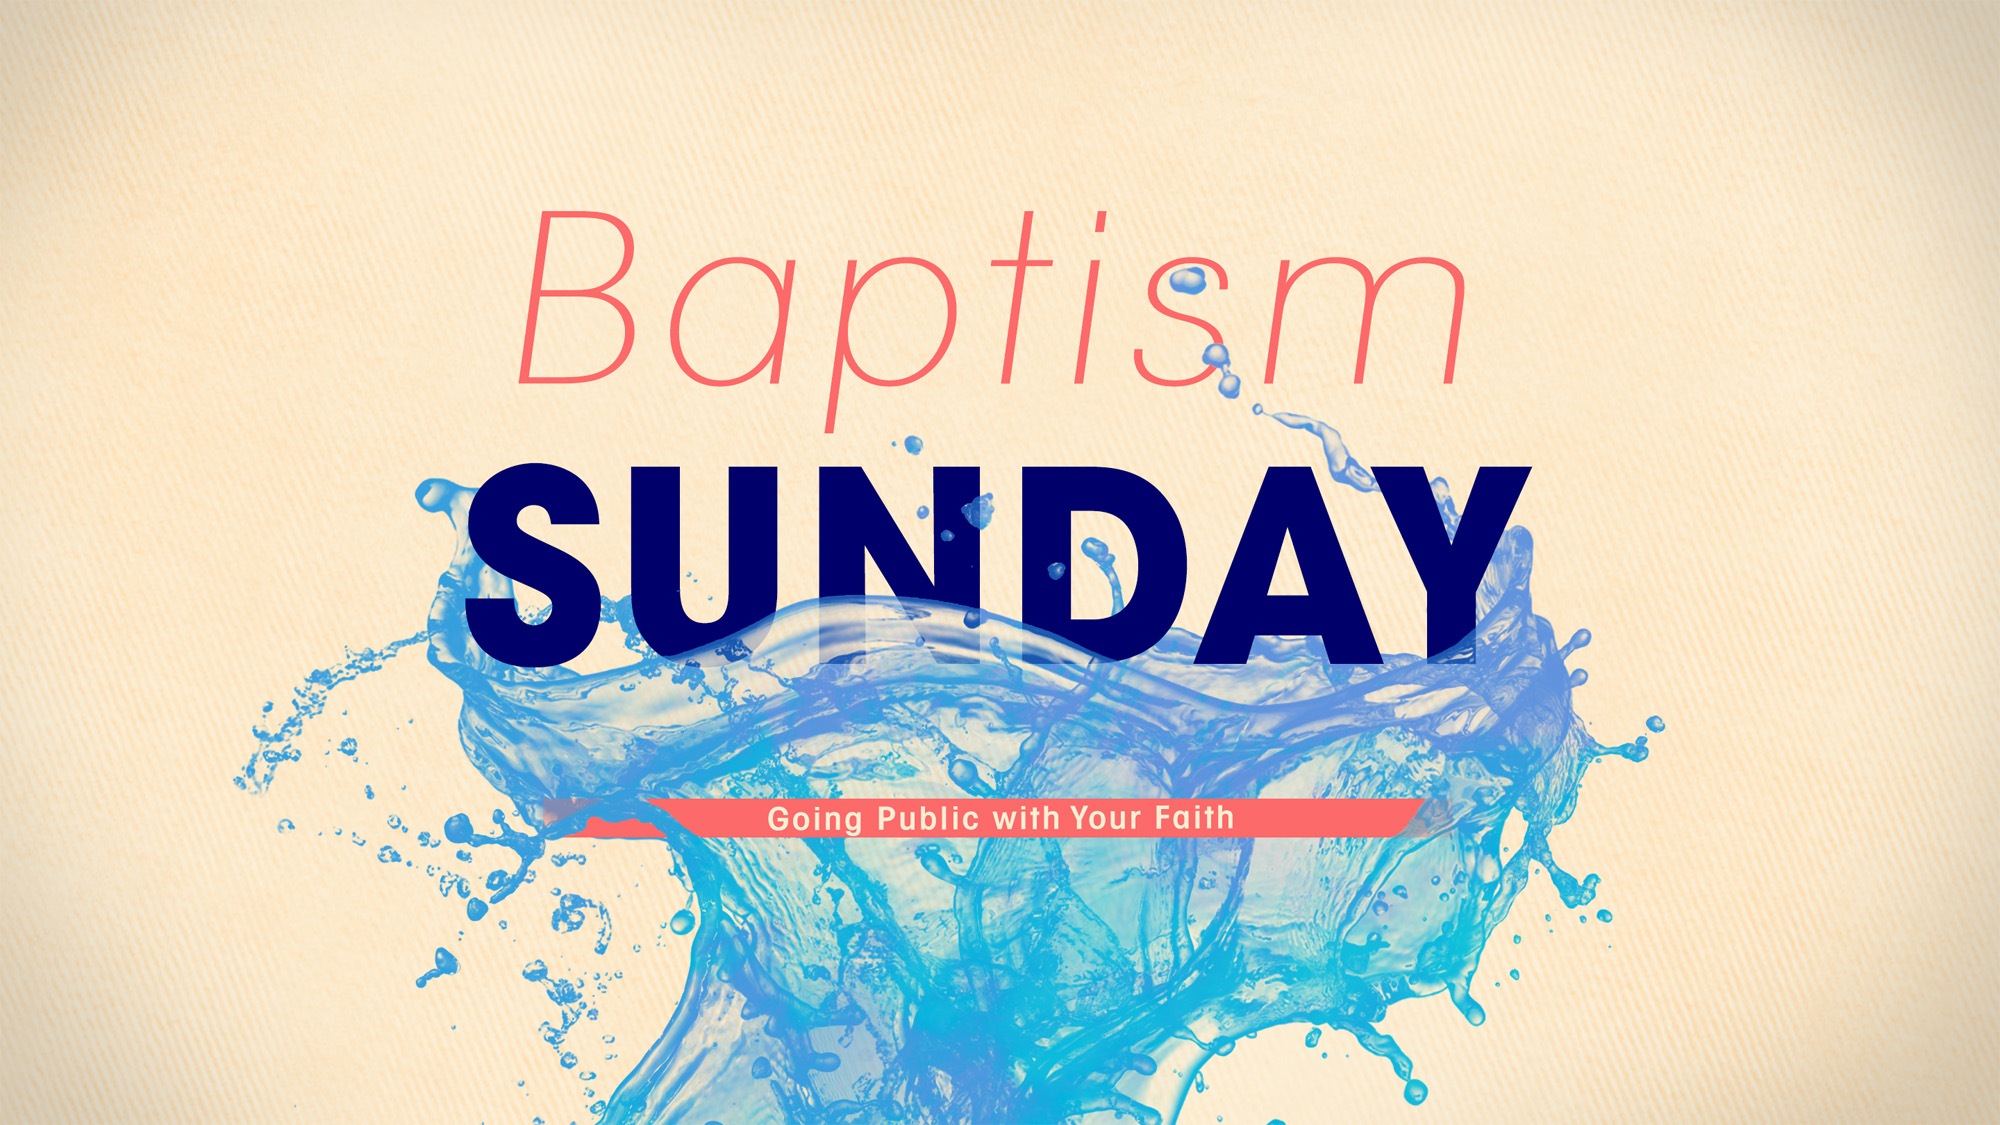 splash_baptism_sunday-title-1-still-16x9